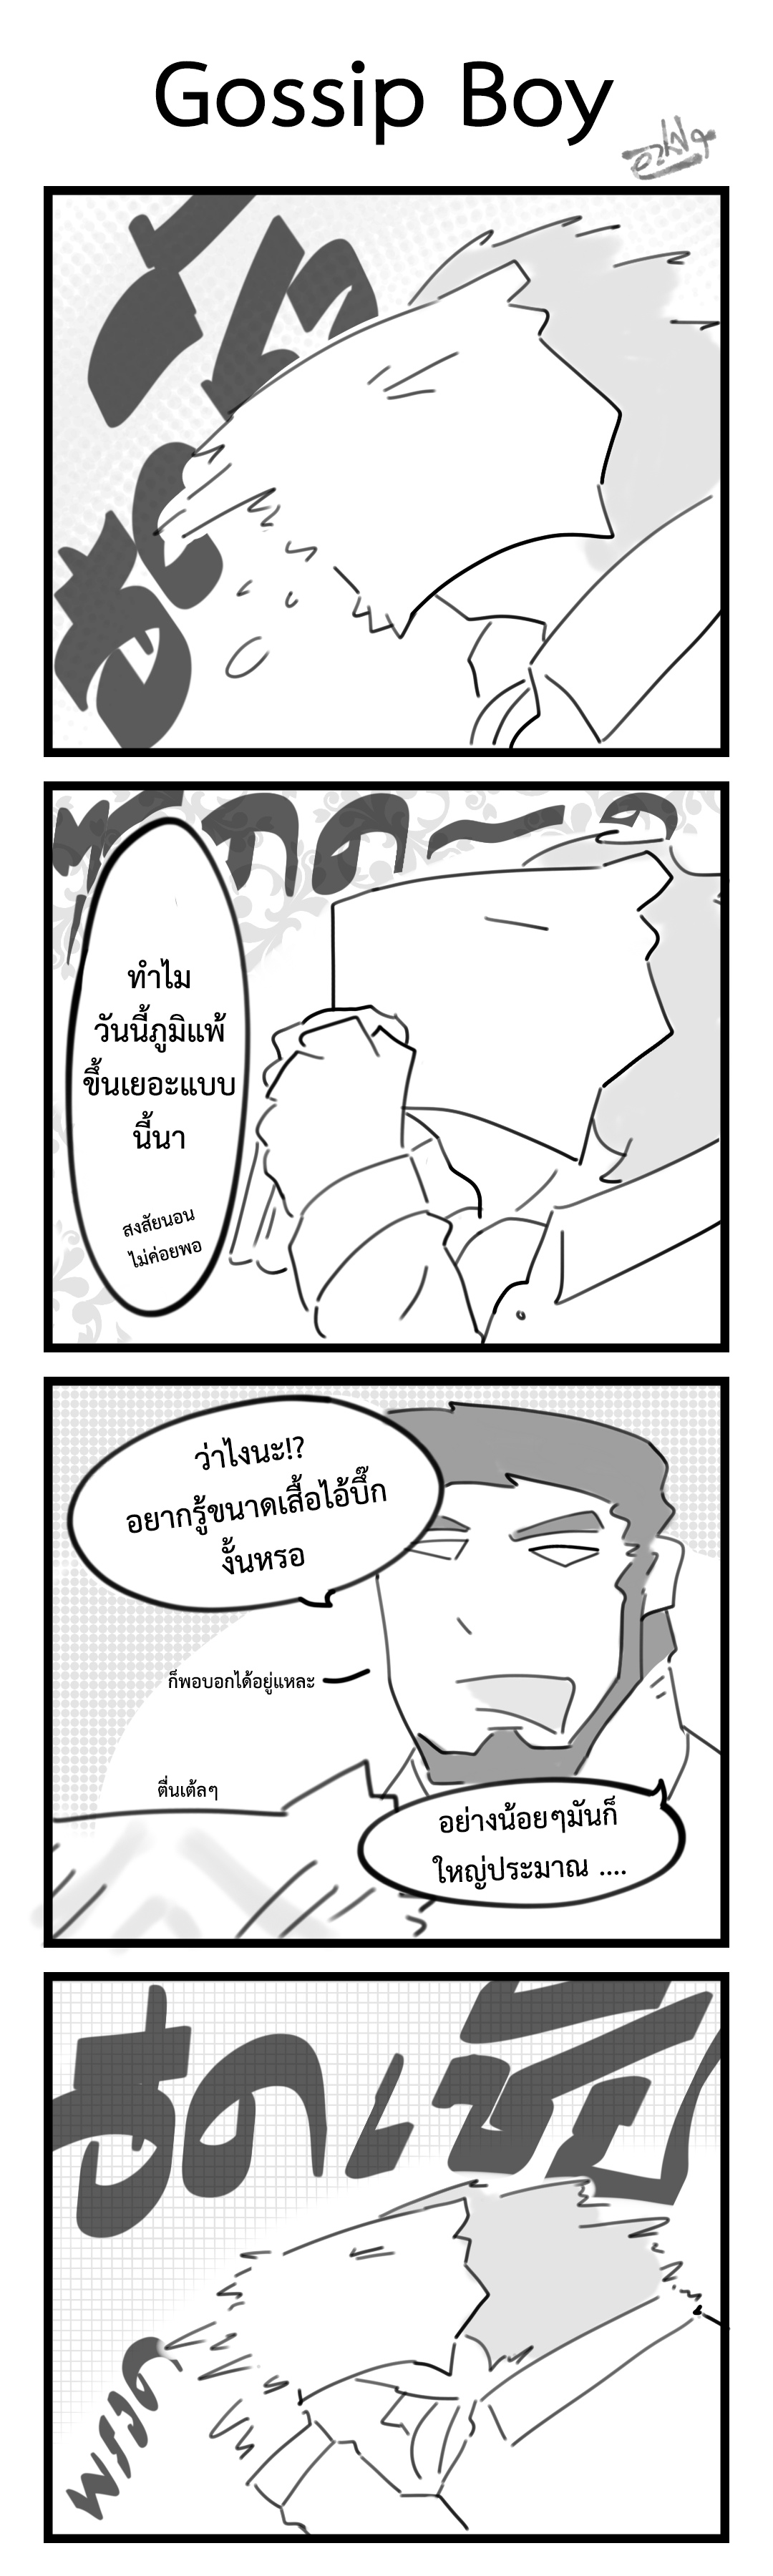 61 - Gossip Boy